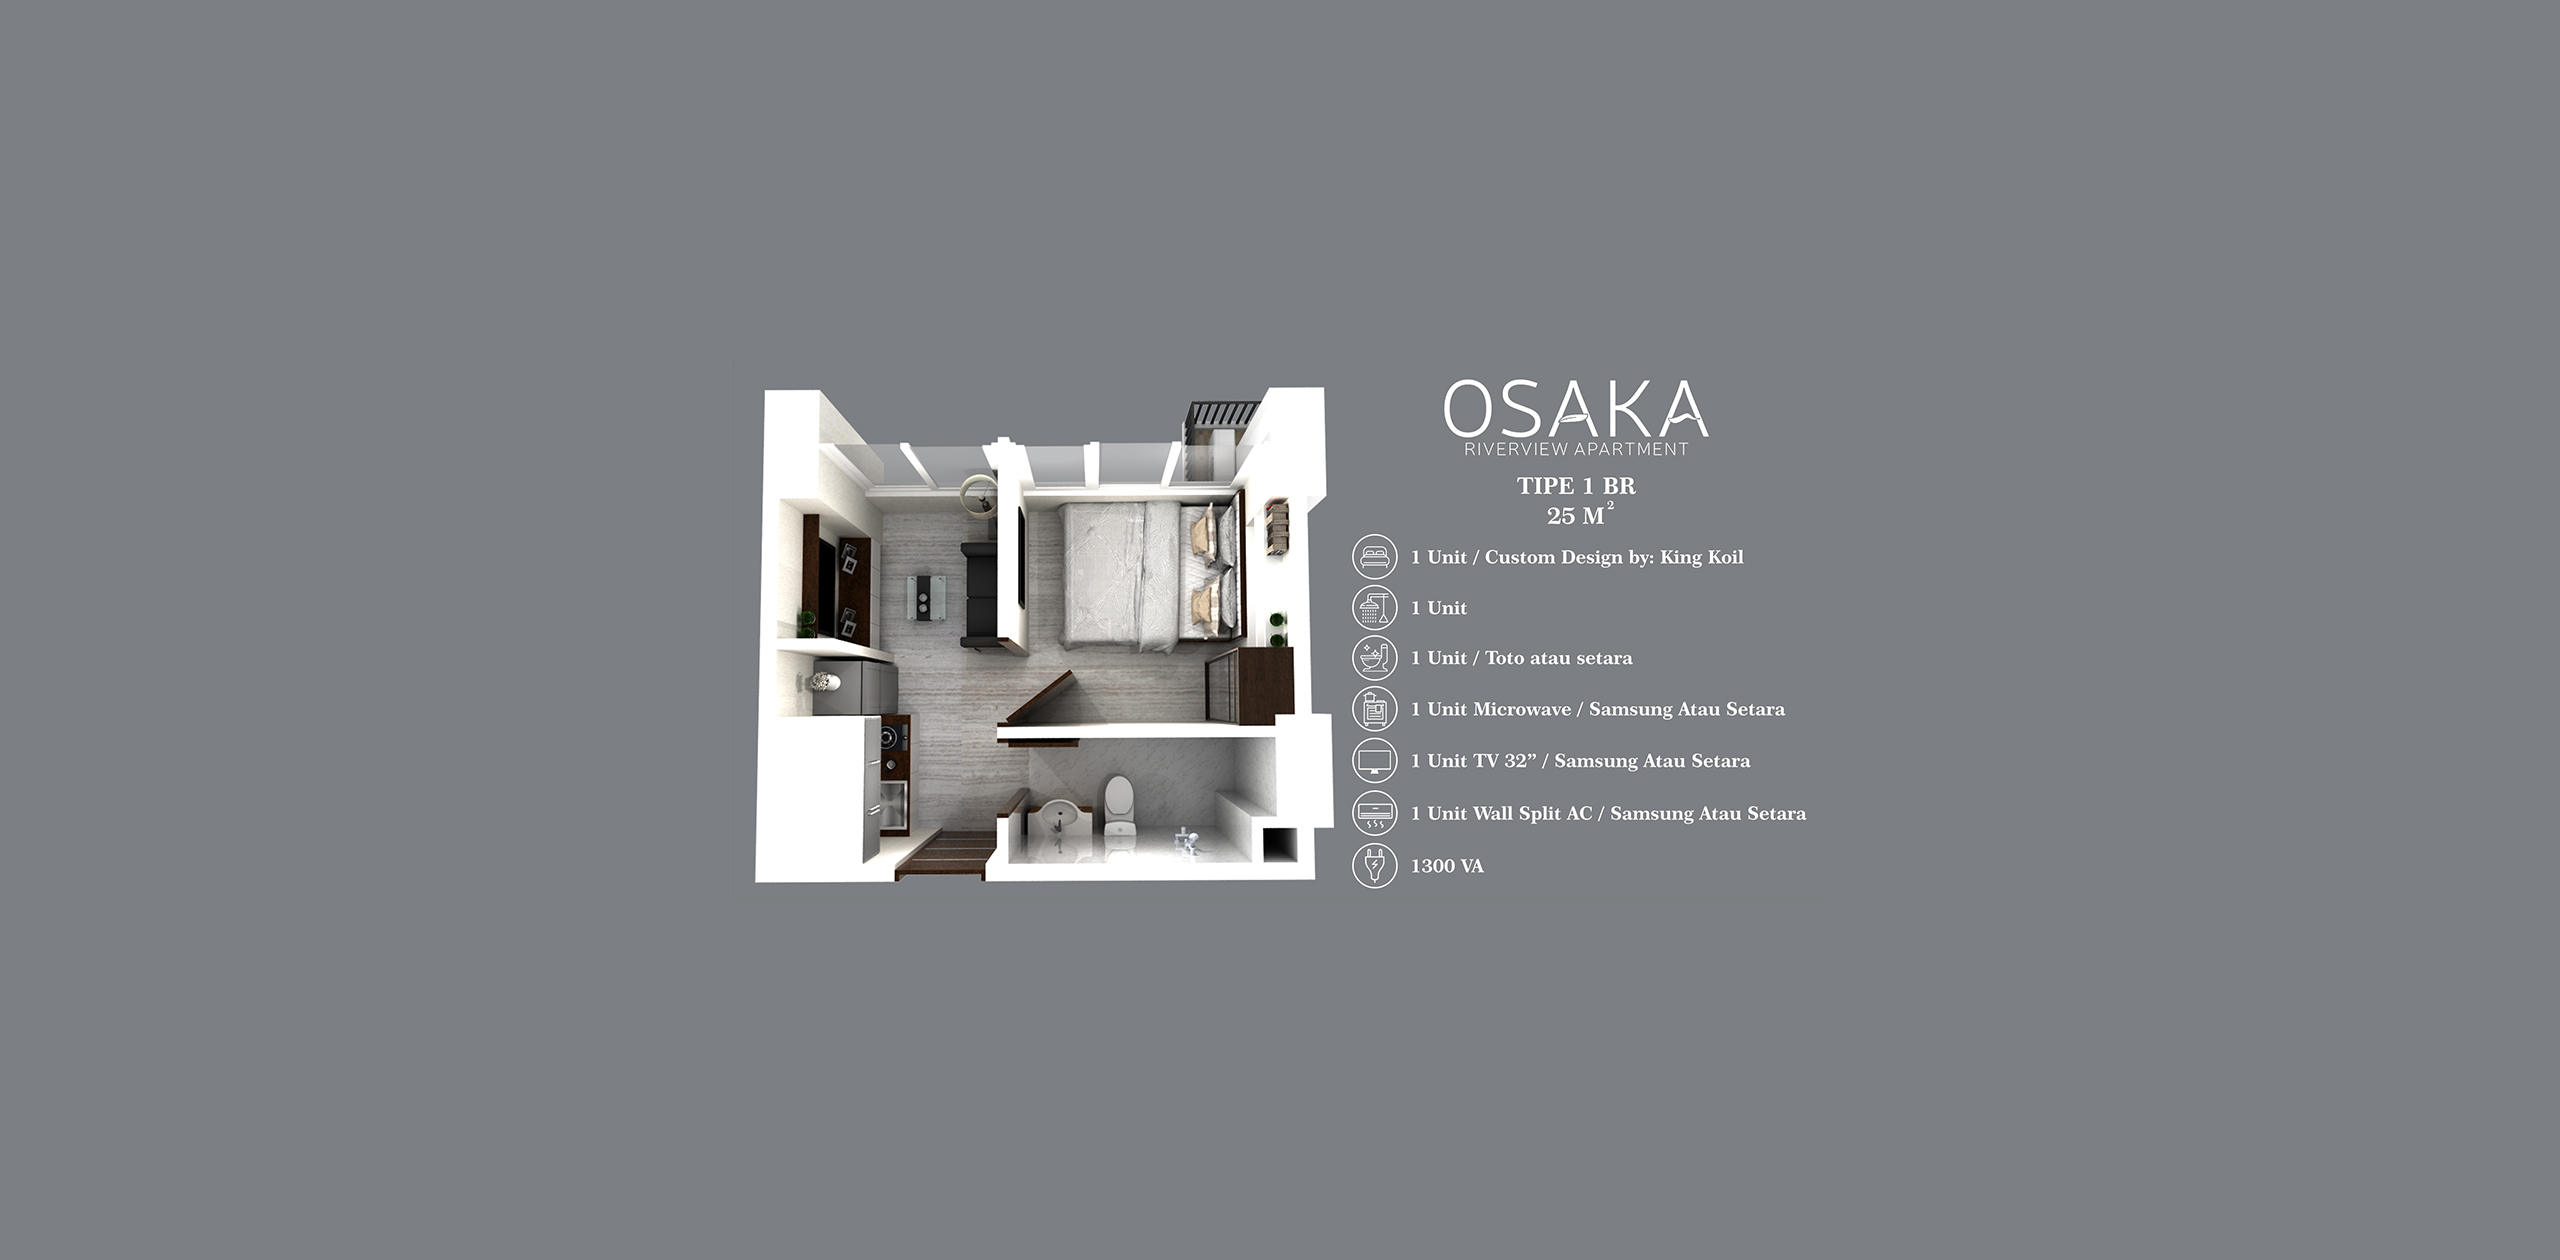 Pik2 - Osaka Riverview - 1BR